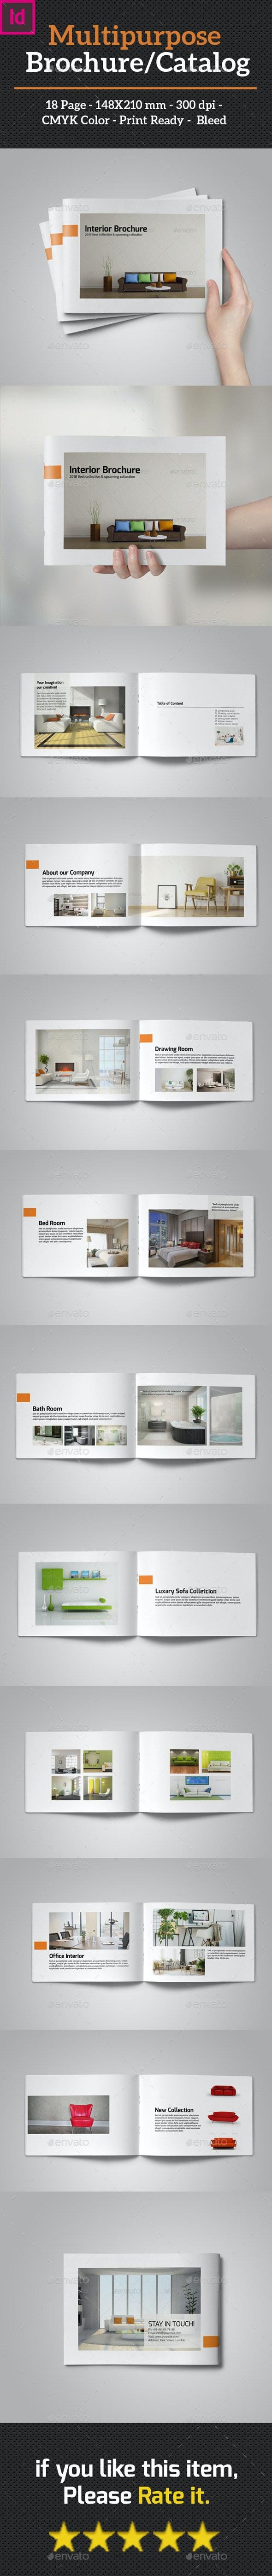 Multipurpose Brochure/Catalog - Catalogs Brochures